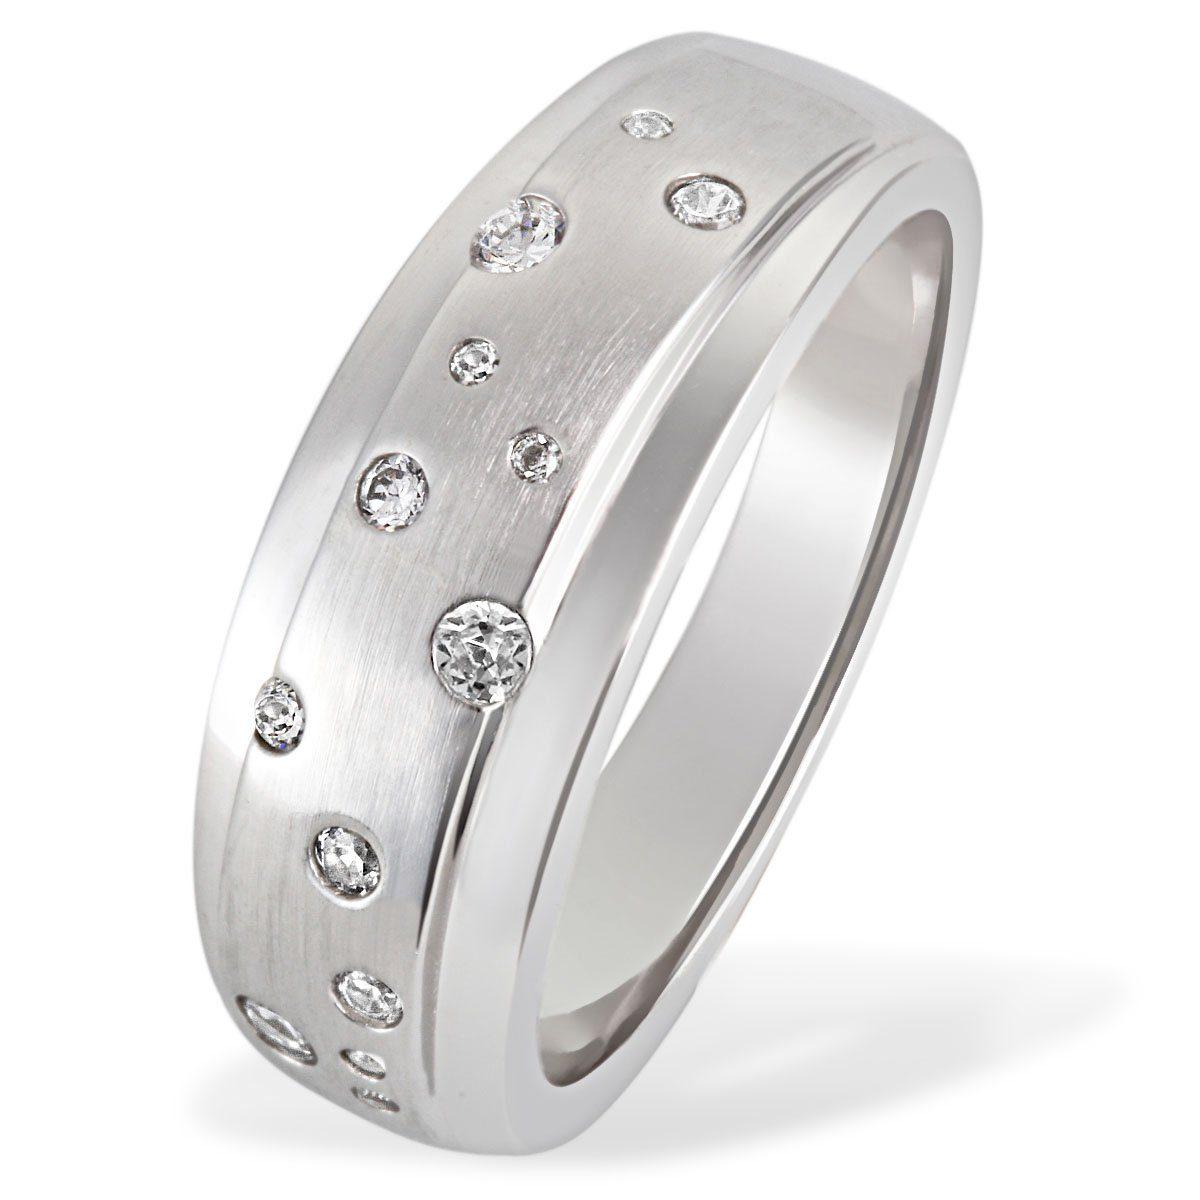 Averdin Damenring 925/- Silber 13 Zirkonia Sternenhimmel jetztbilligerkaufen